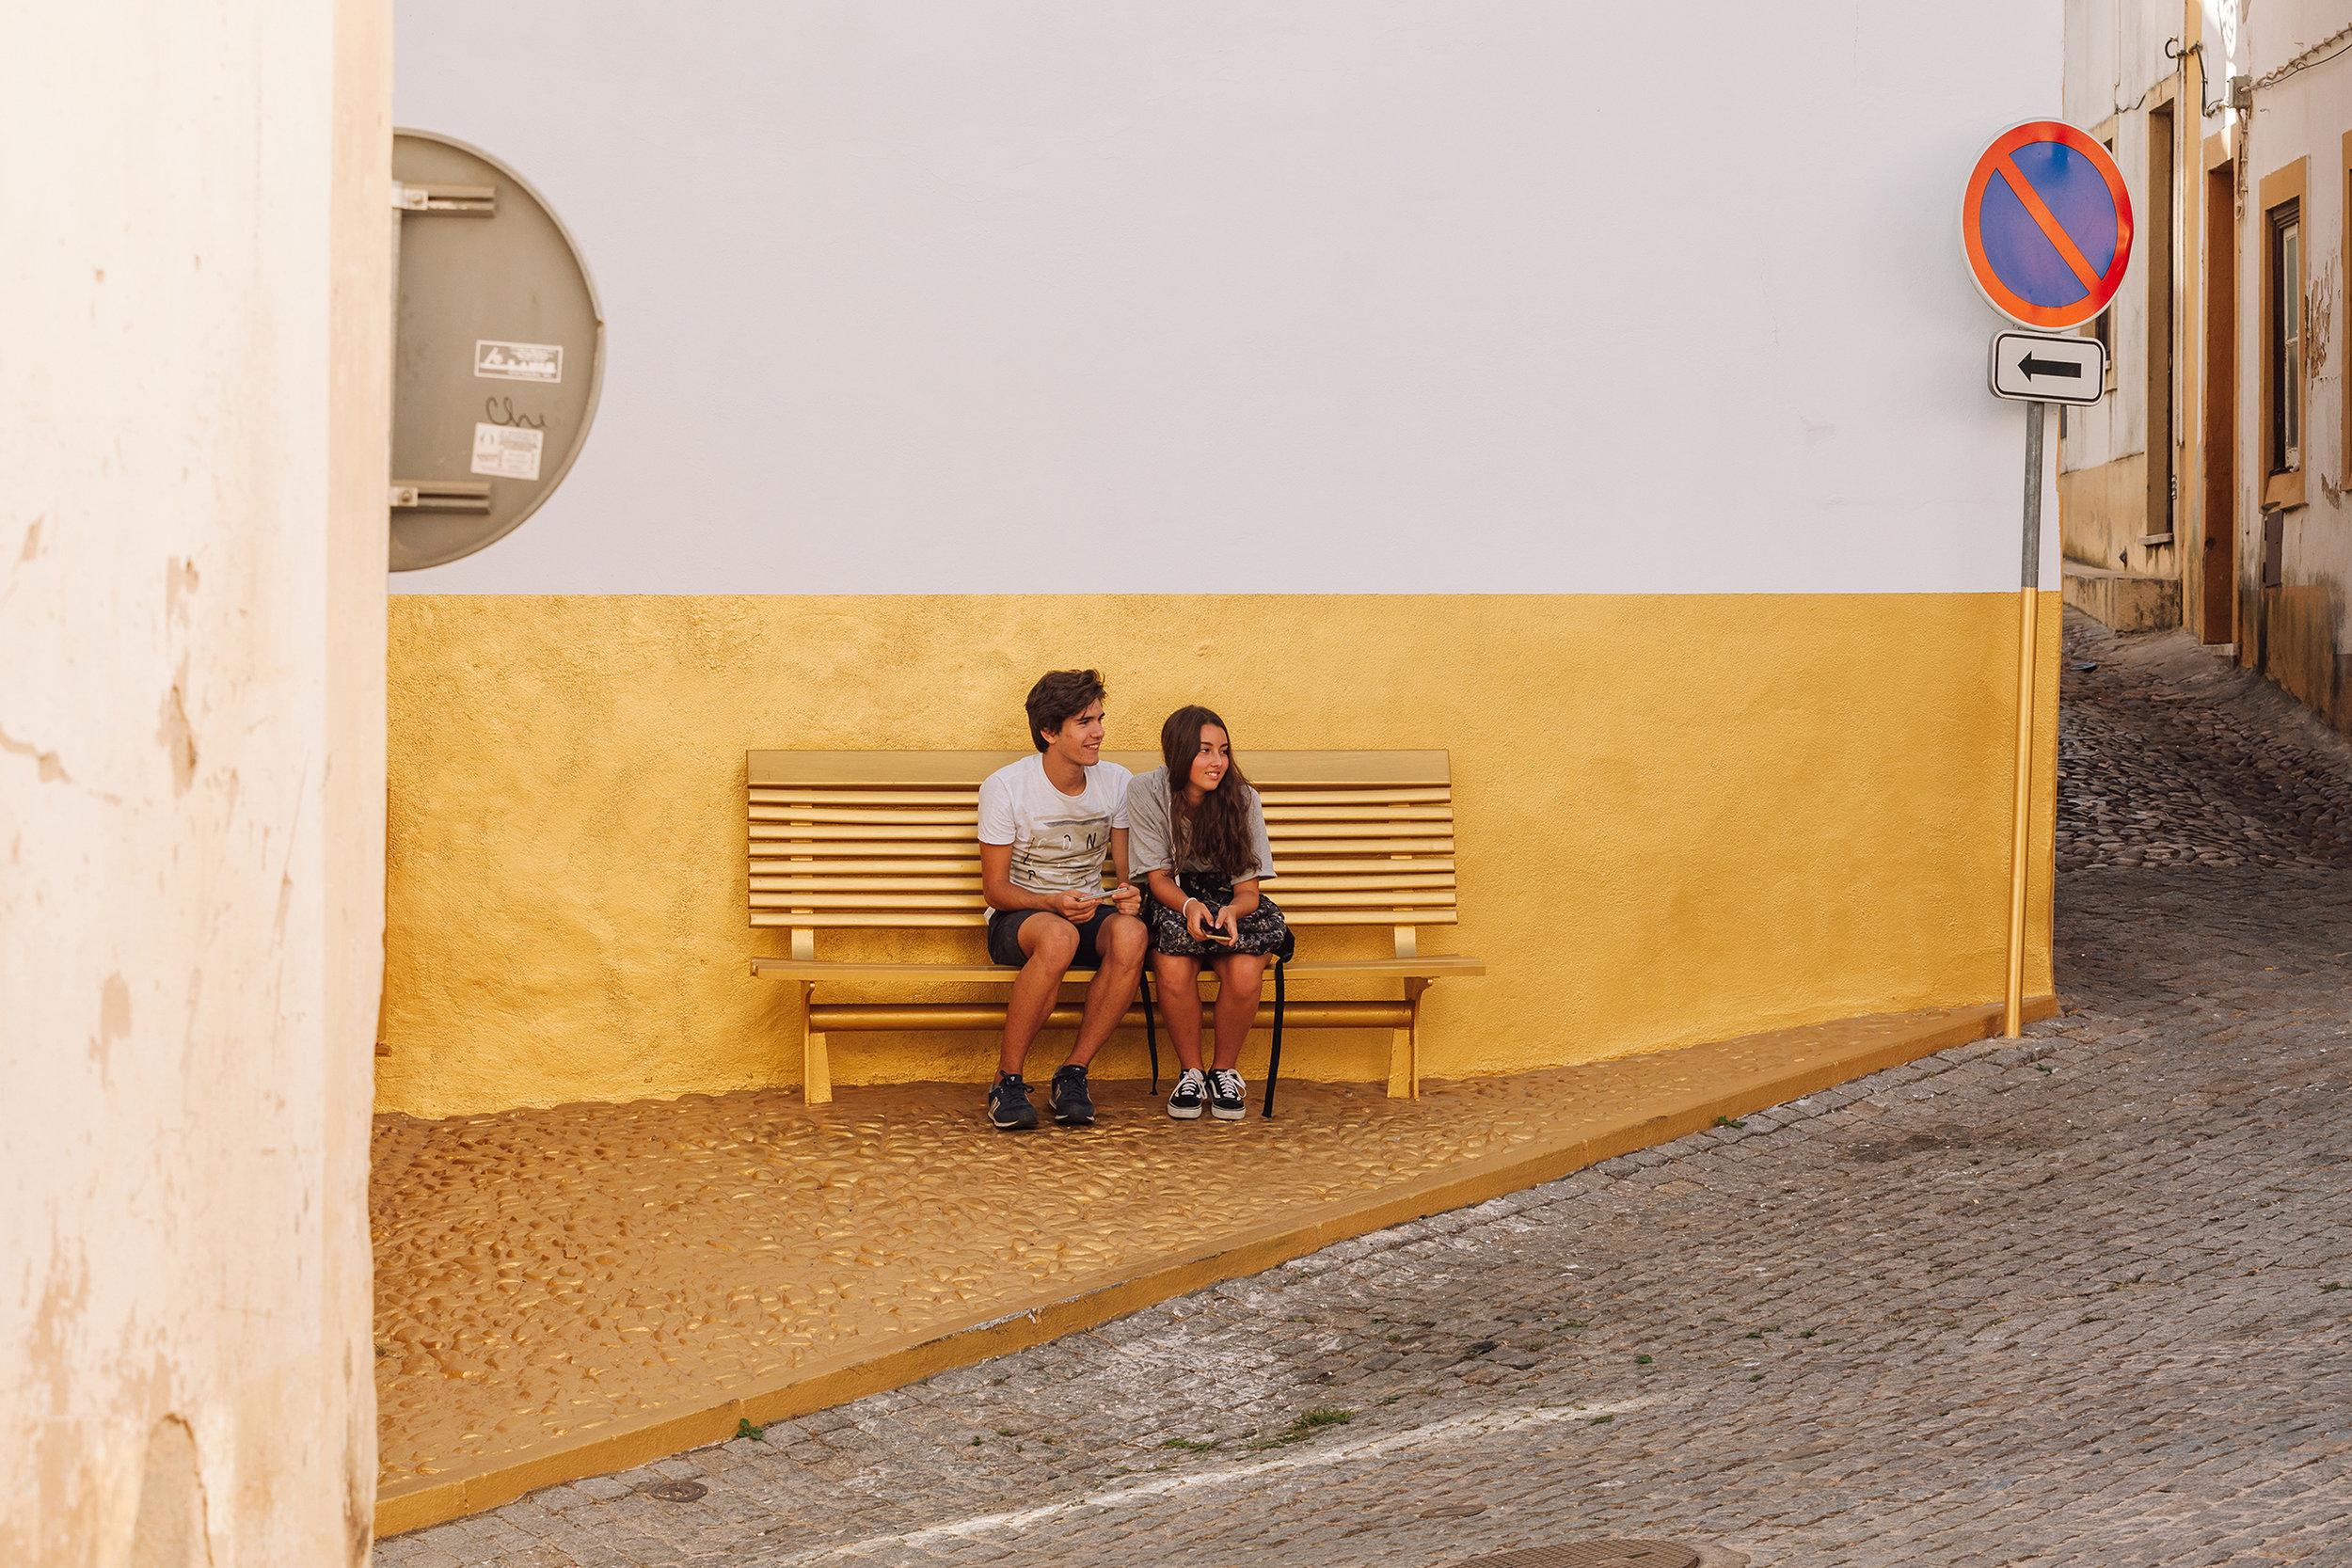 © 2017 Francisco Nogueira Architectural Photography